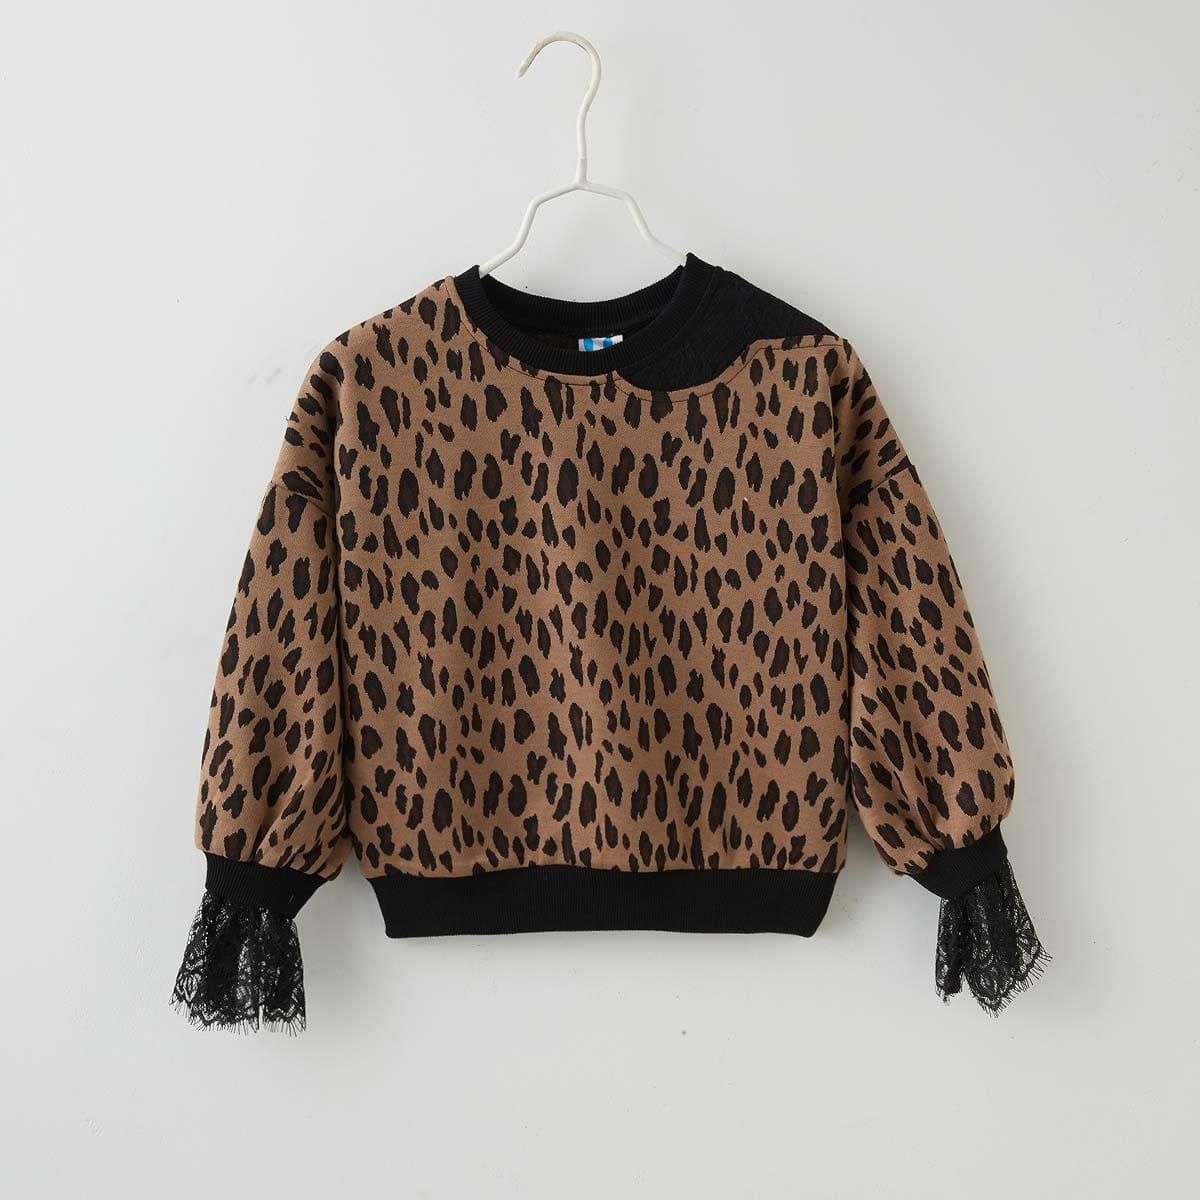 Girls Contrast Lace Leopard Sweatshirt, SHEIN  - buy with discount